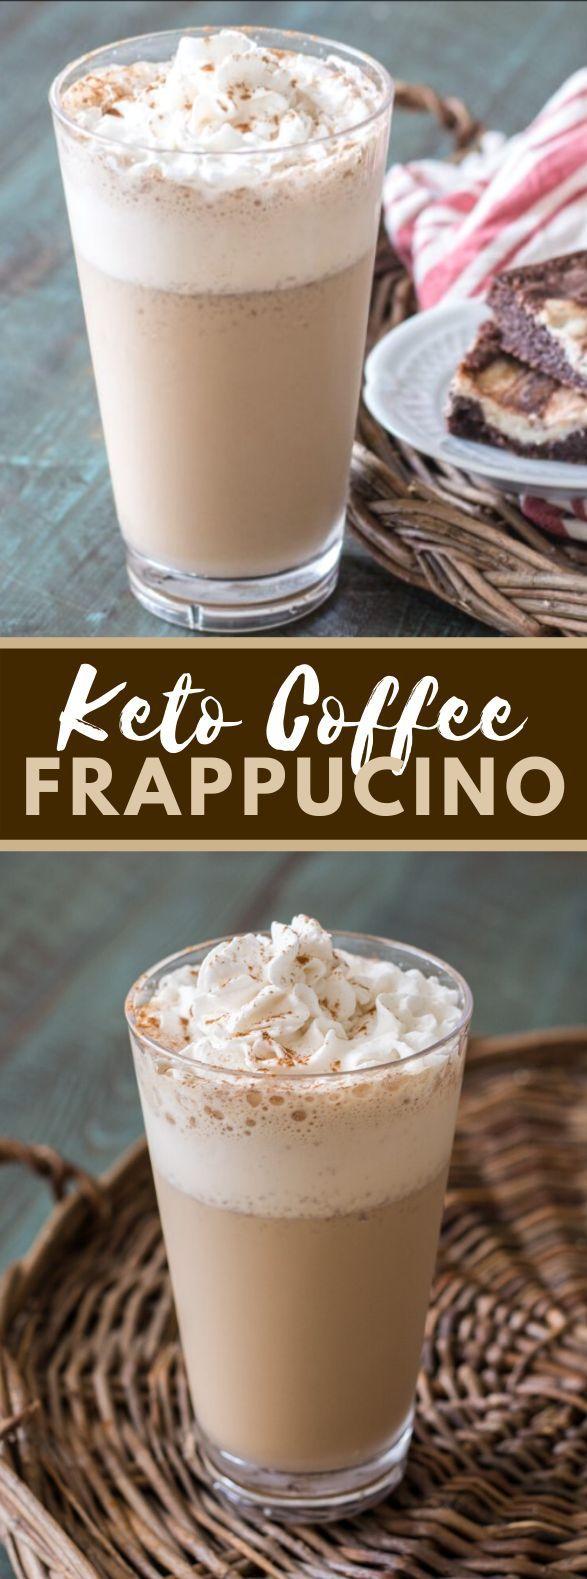 Keto Coffee Frappuccino (Starbucks Copycat) drinks